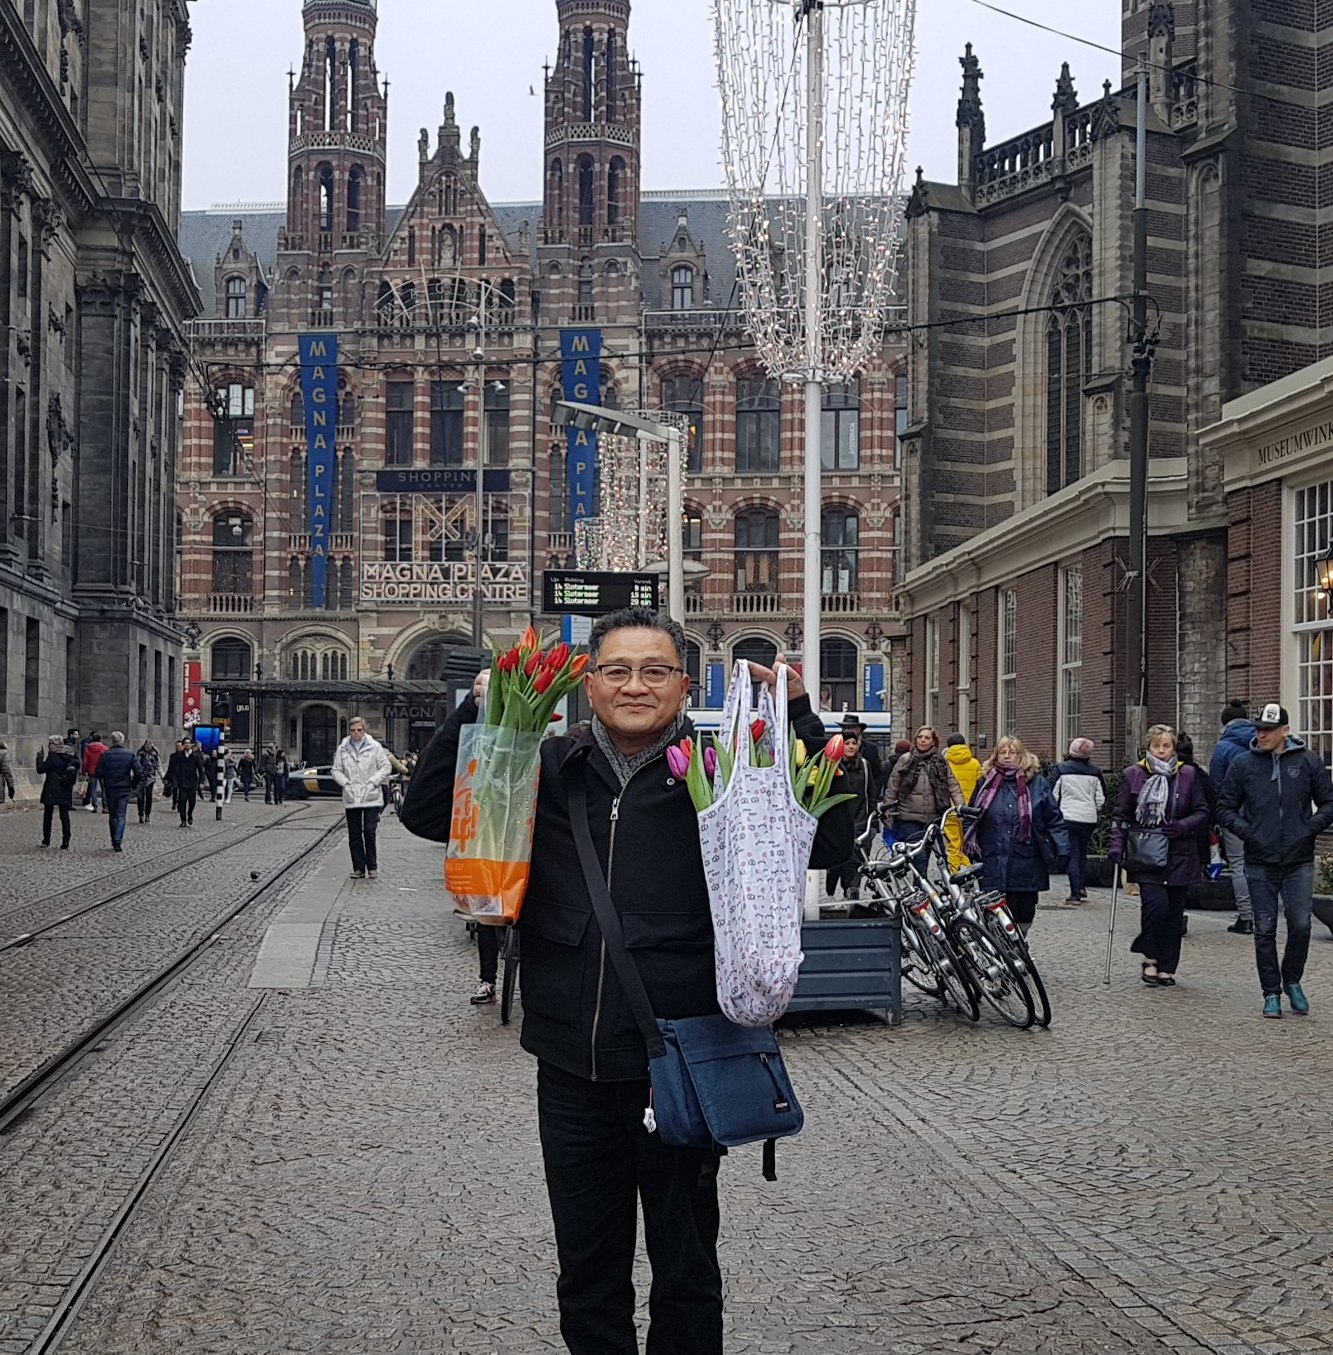 Wisata Musim Semi, Bunga Tulip yang Indah, Serbalanda, Tour Giethoorn dan Keukenhof